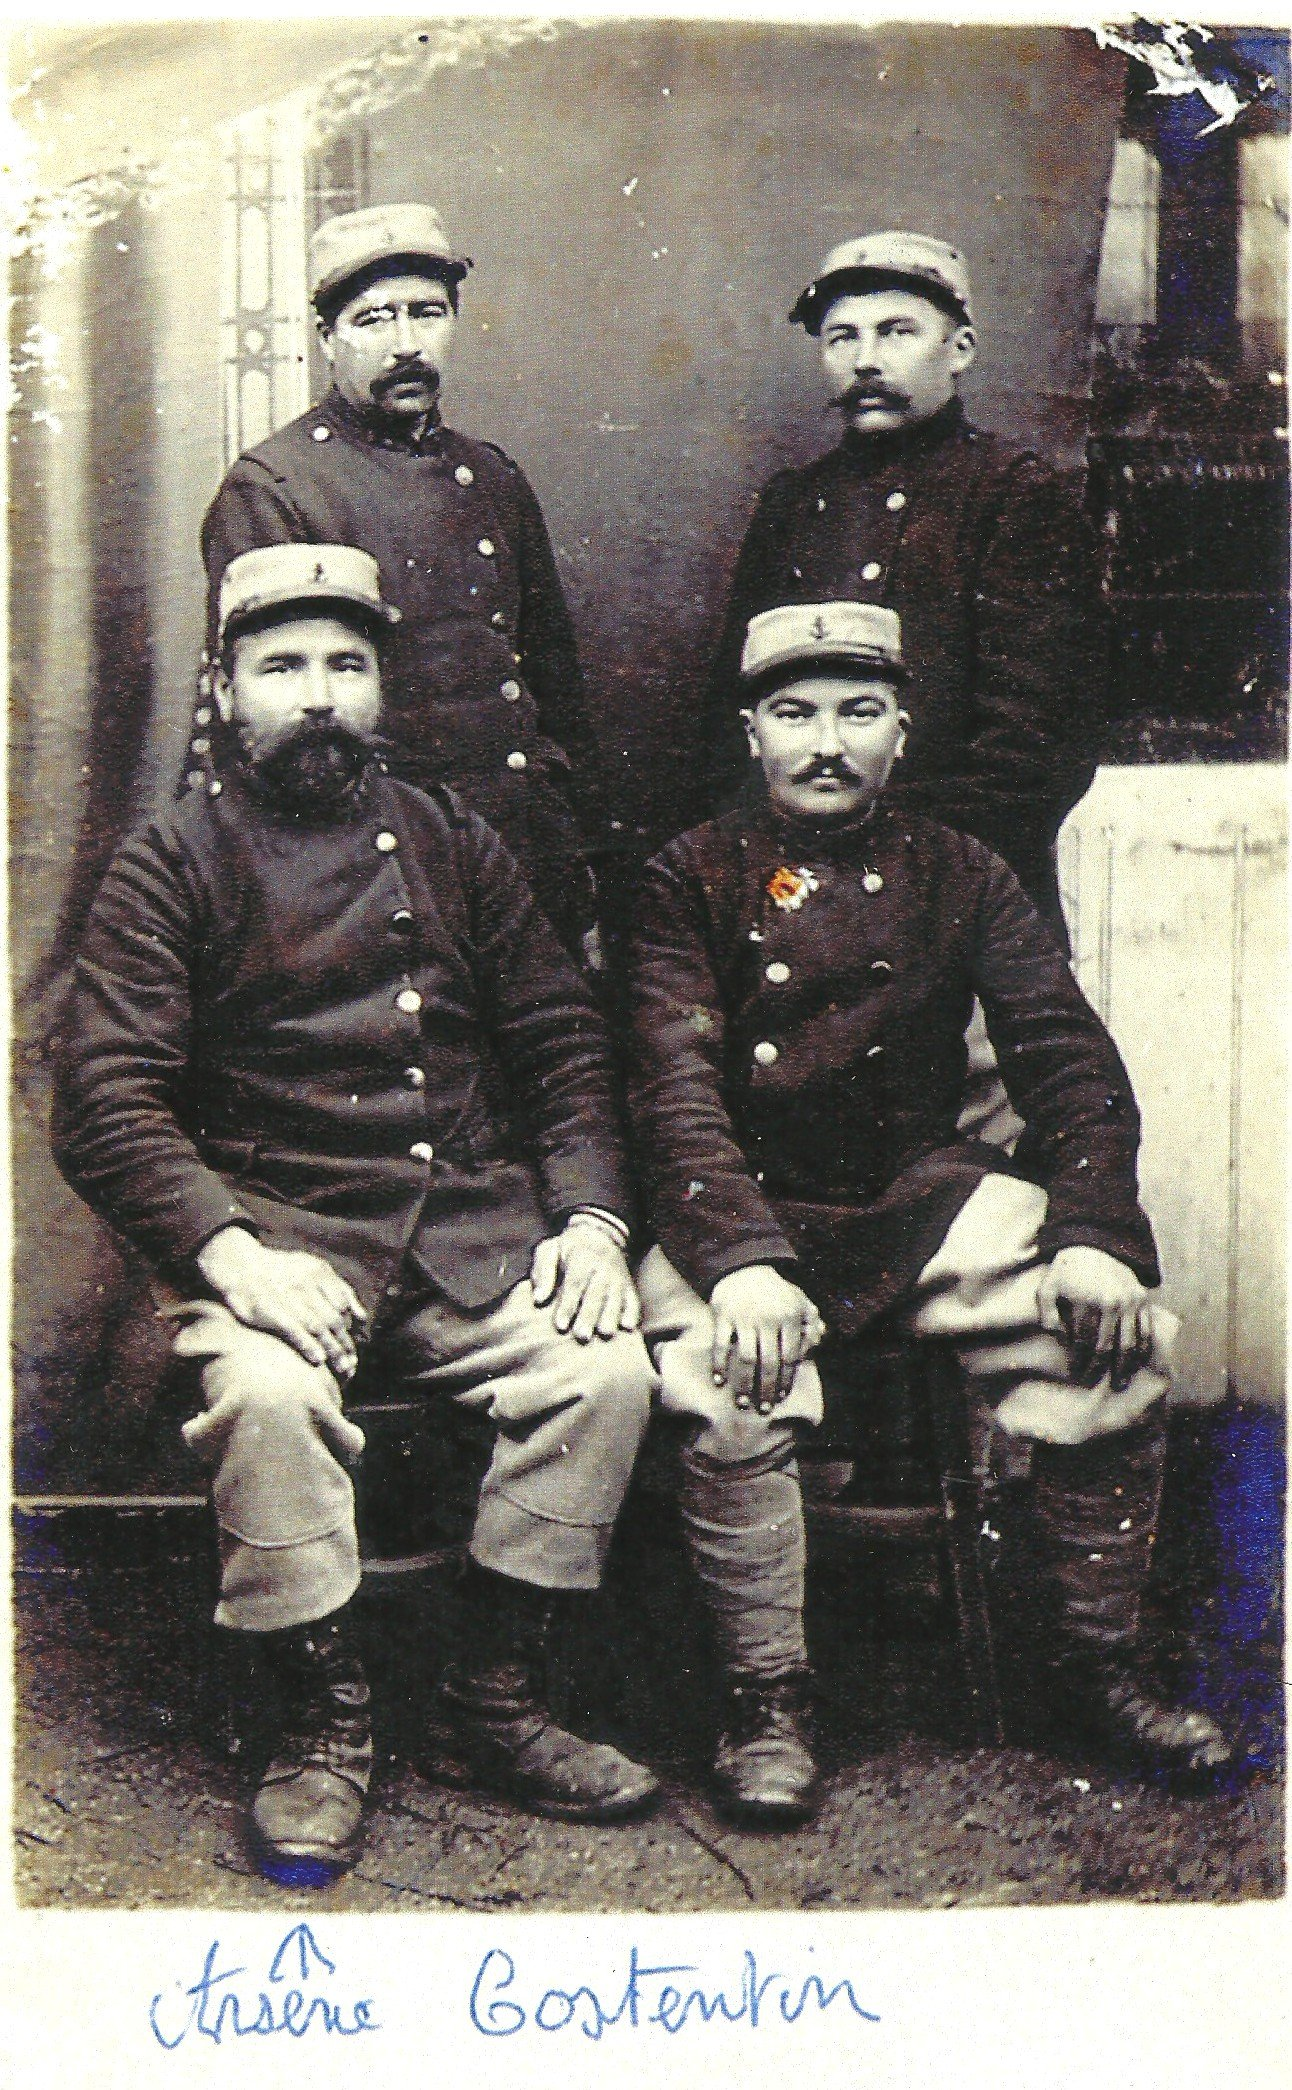 Arsène à la barbe bien fournie, assis à gauche